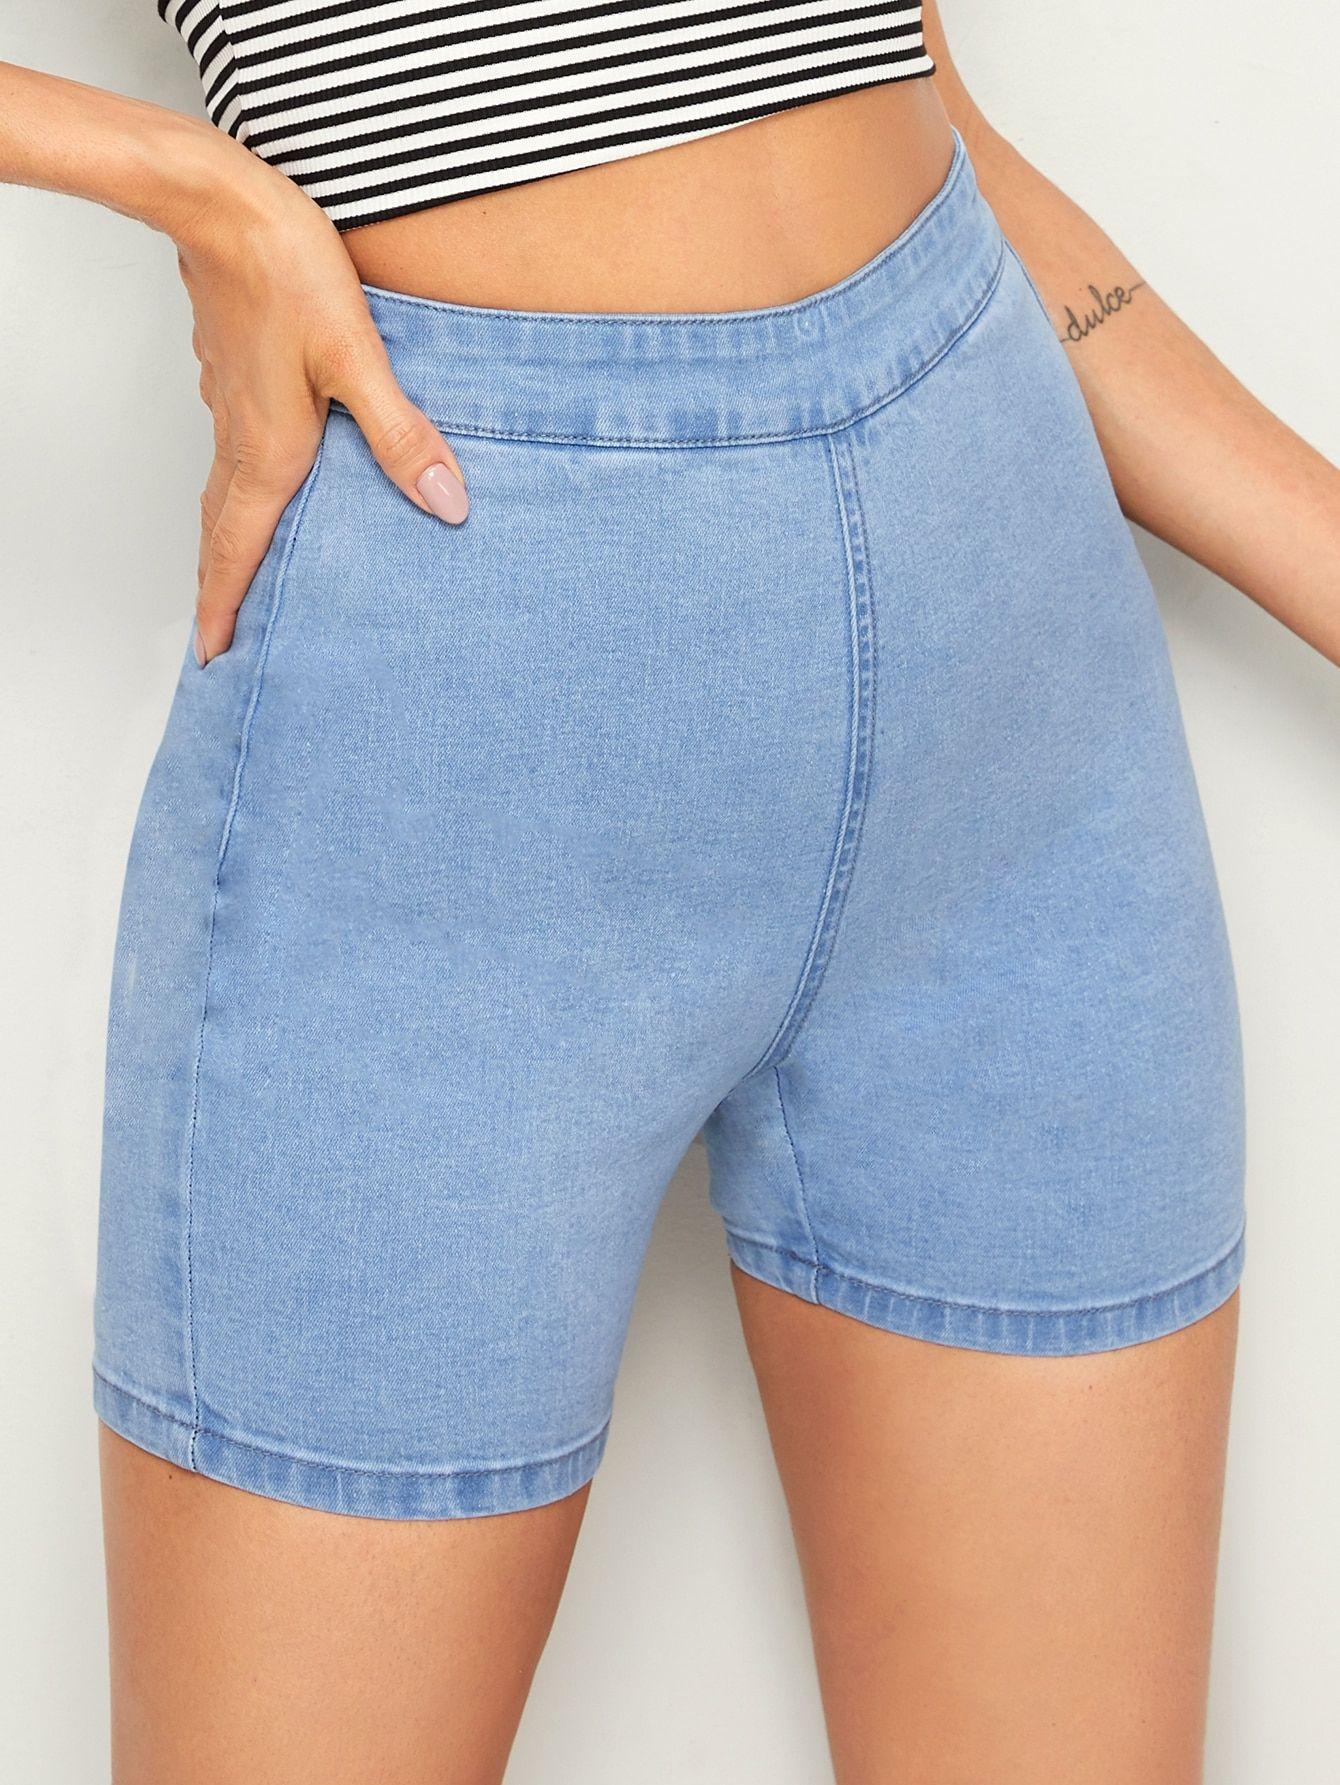 Ad Zip Back High Waist Skinny Denim Shorts Tags Zipper Fly Blue Pastel Zipper Fabric Is Very Stretchy Skin Skinny Denim High Waist Skinny Denim Fashion